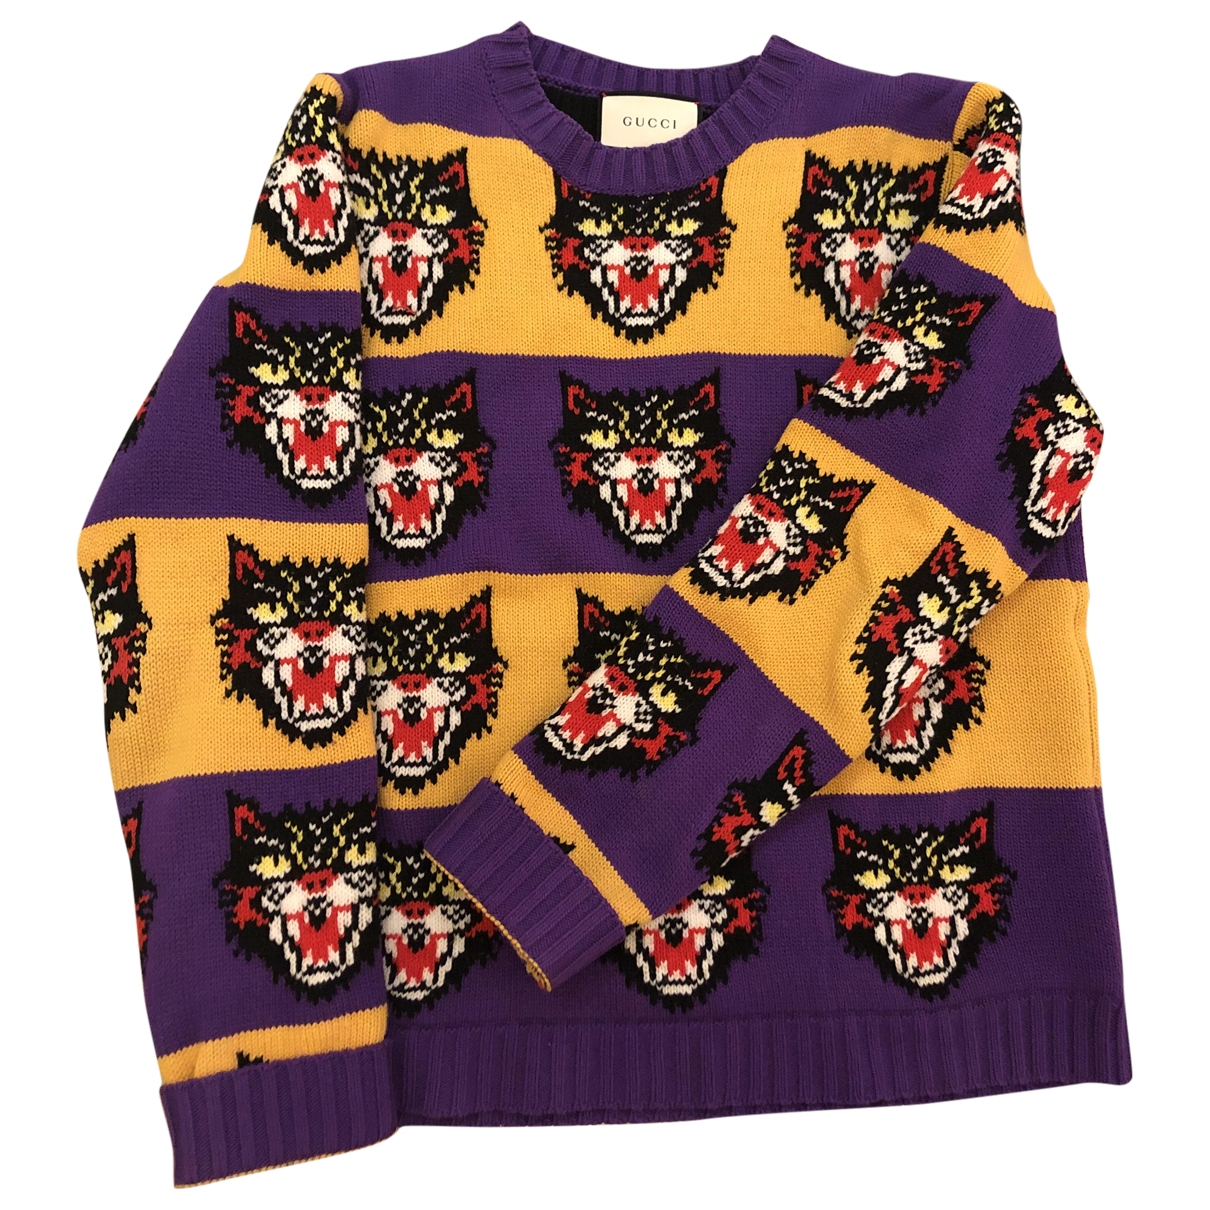 Gucci \N Multicolour Cotton Knitwear & Sweatshirts for Men L International